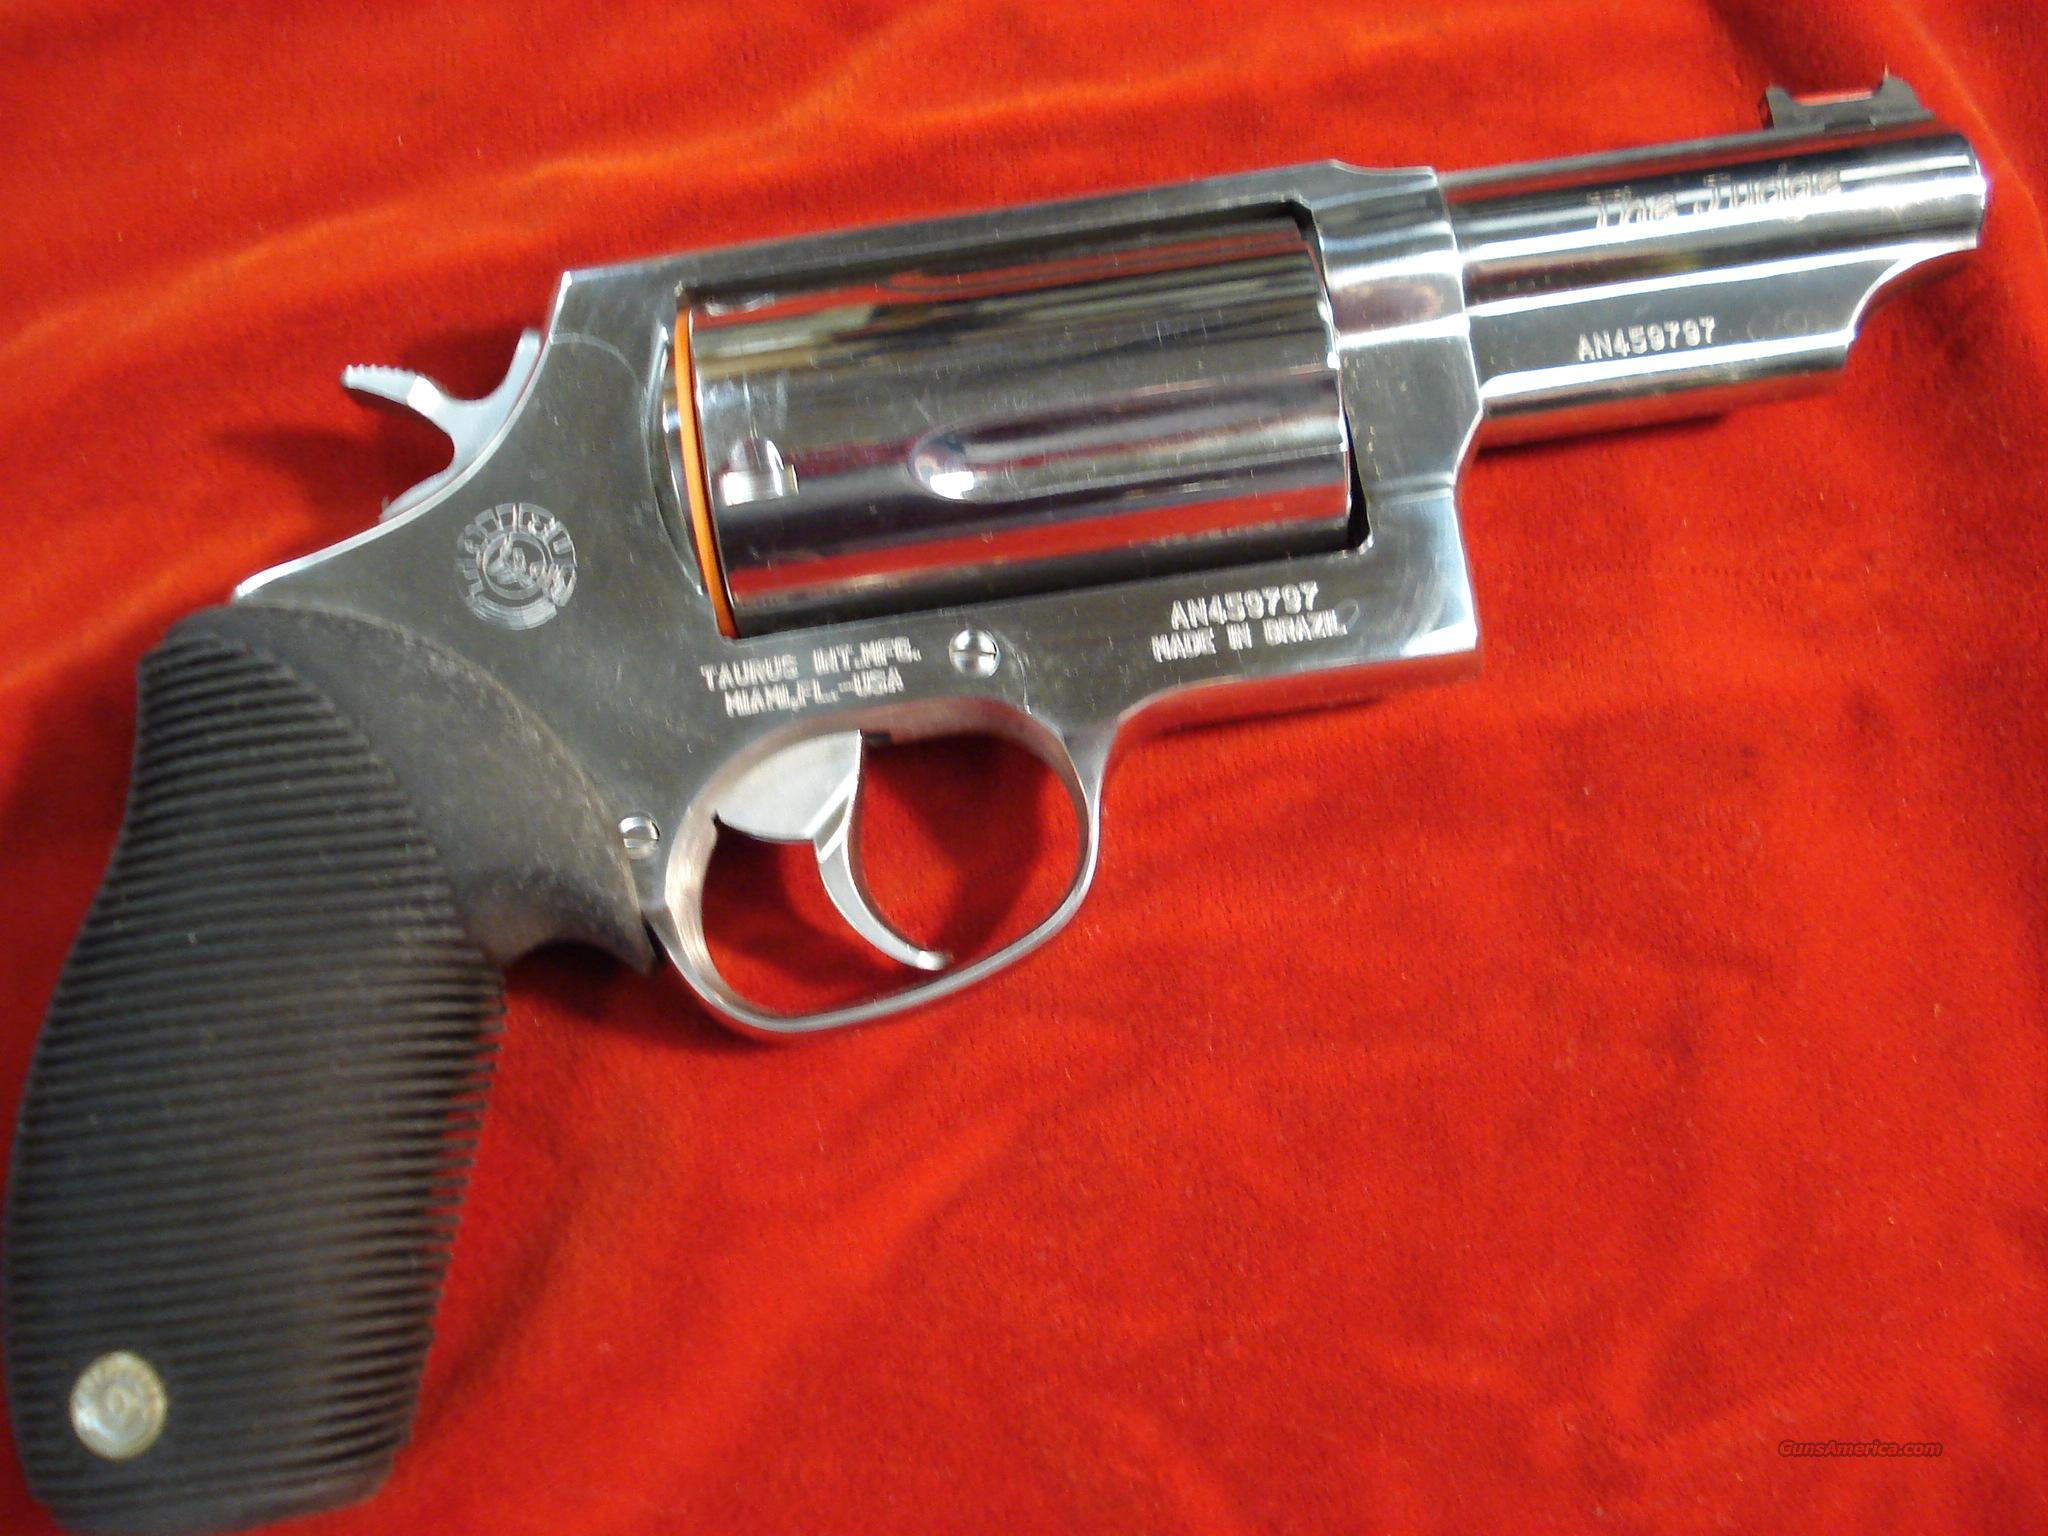 TAURUS M44-TEN 410G REVOLVER POLISHED STAINLESS  Guns > Pistols > Taurus Pistols/Revolvers > Revolvers